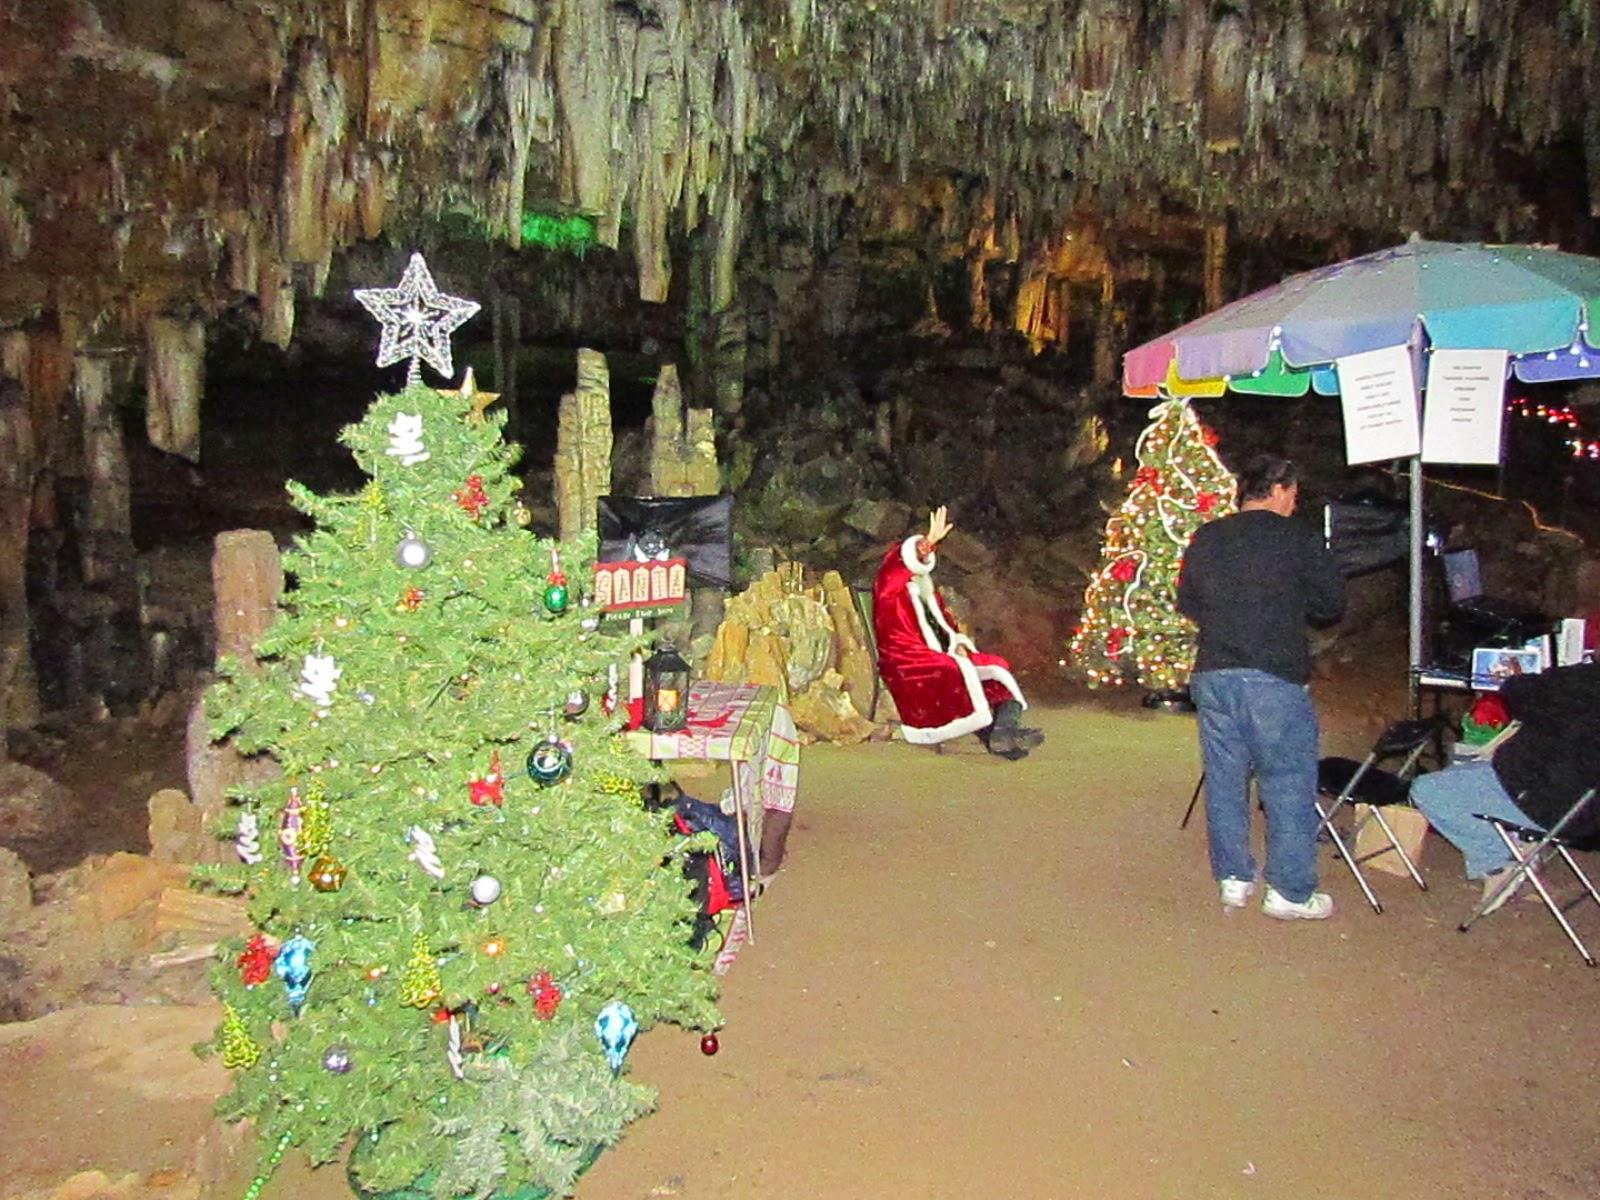 Caverns Cherokee Knoxville Tn